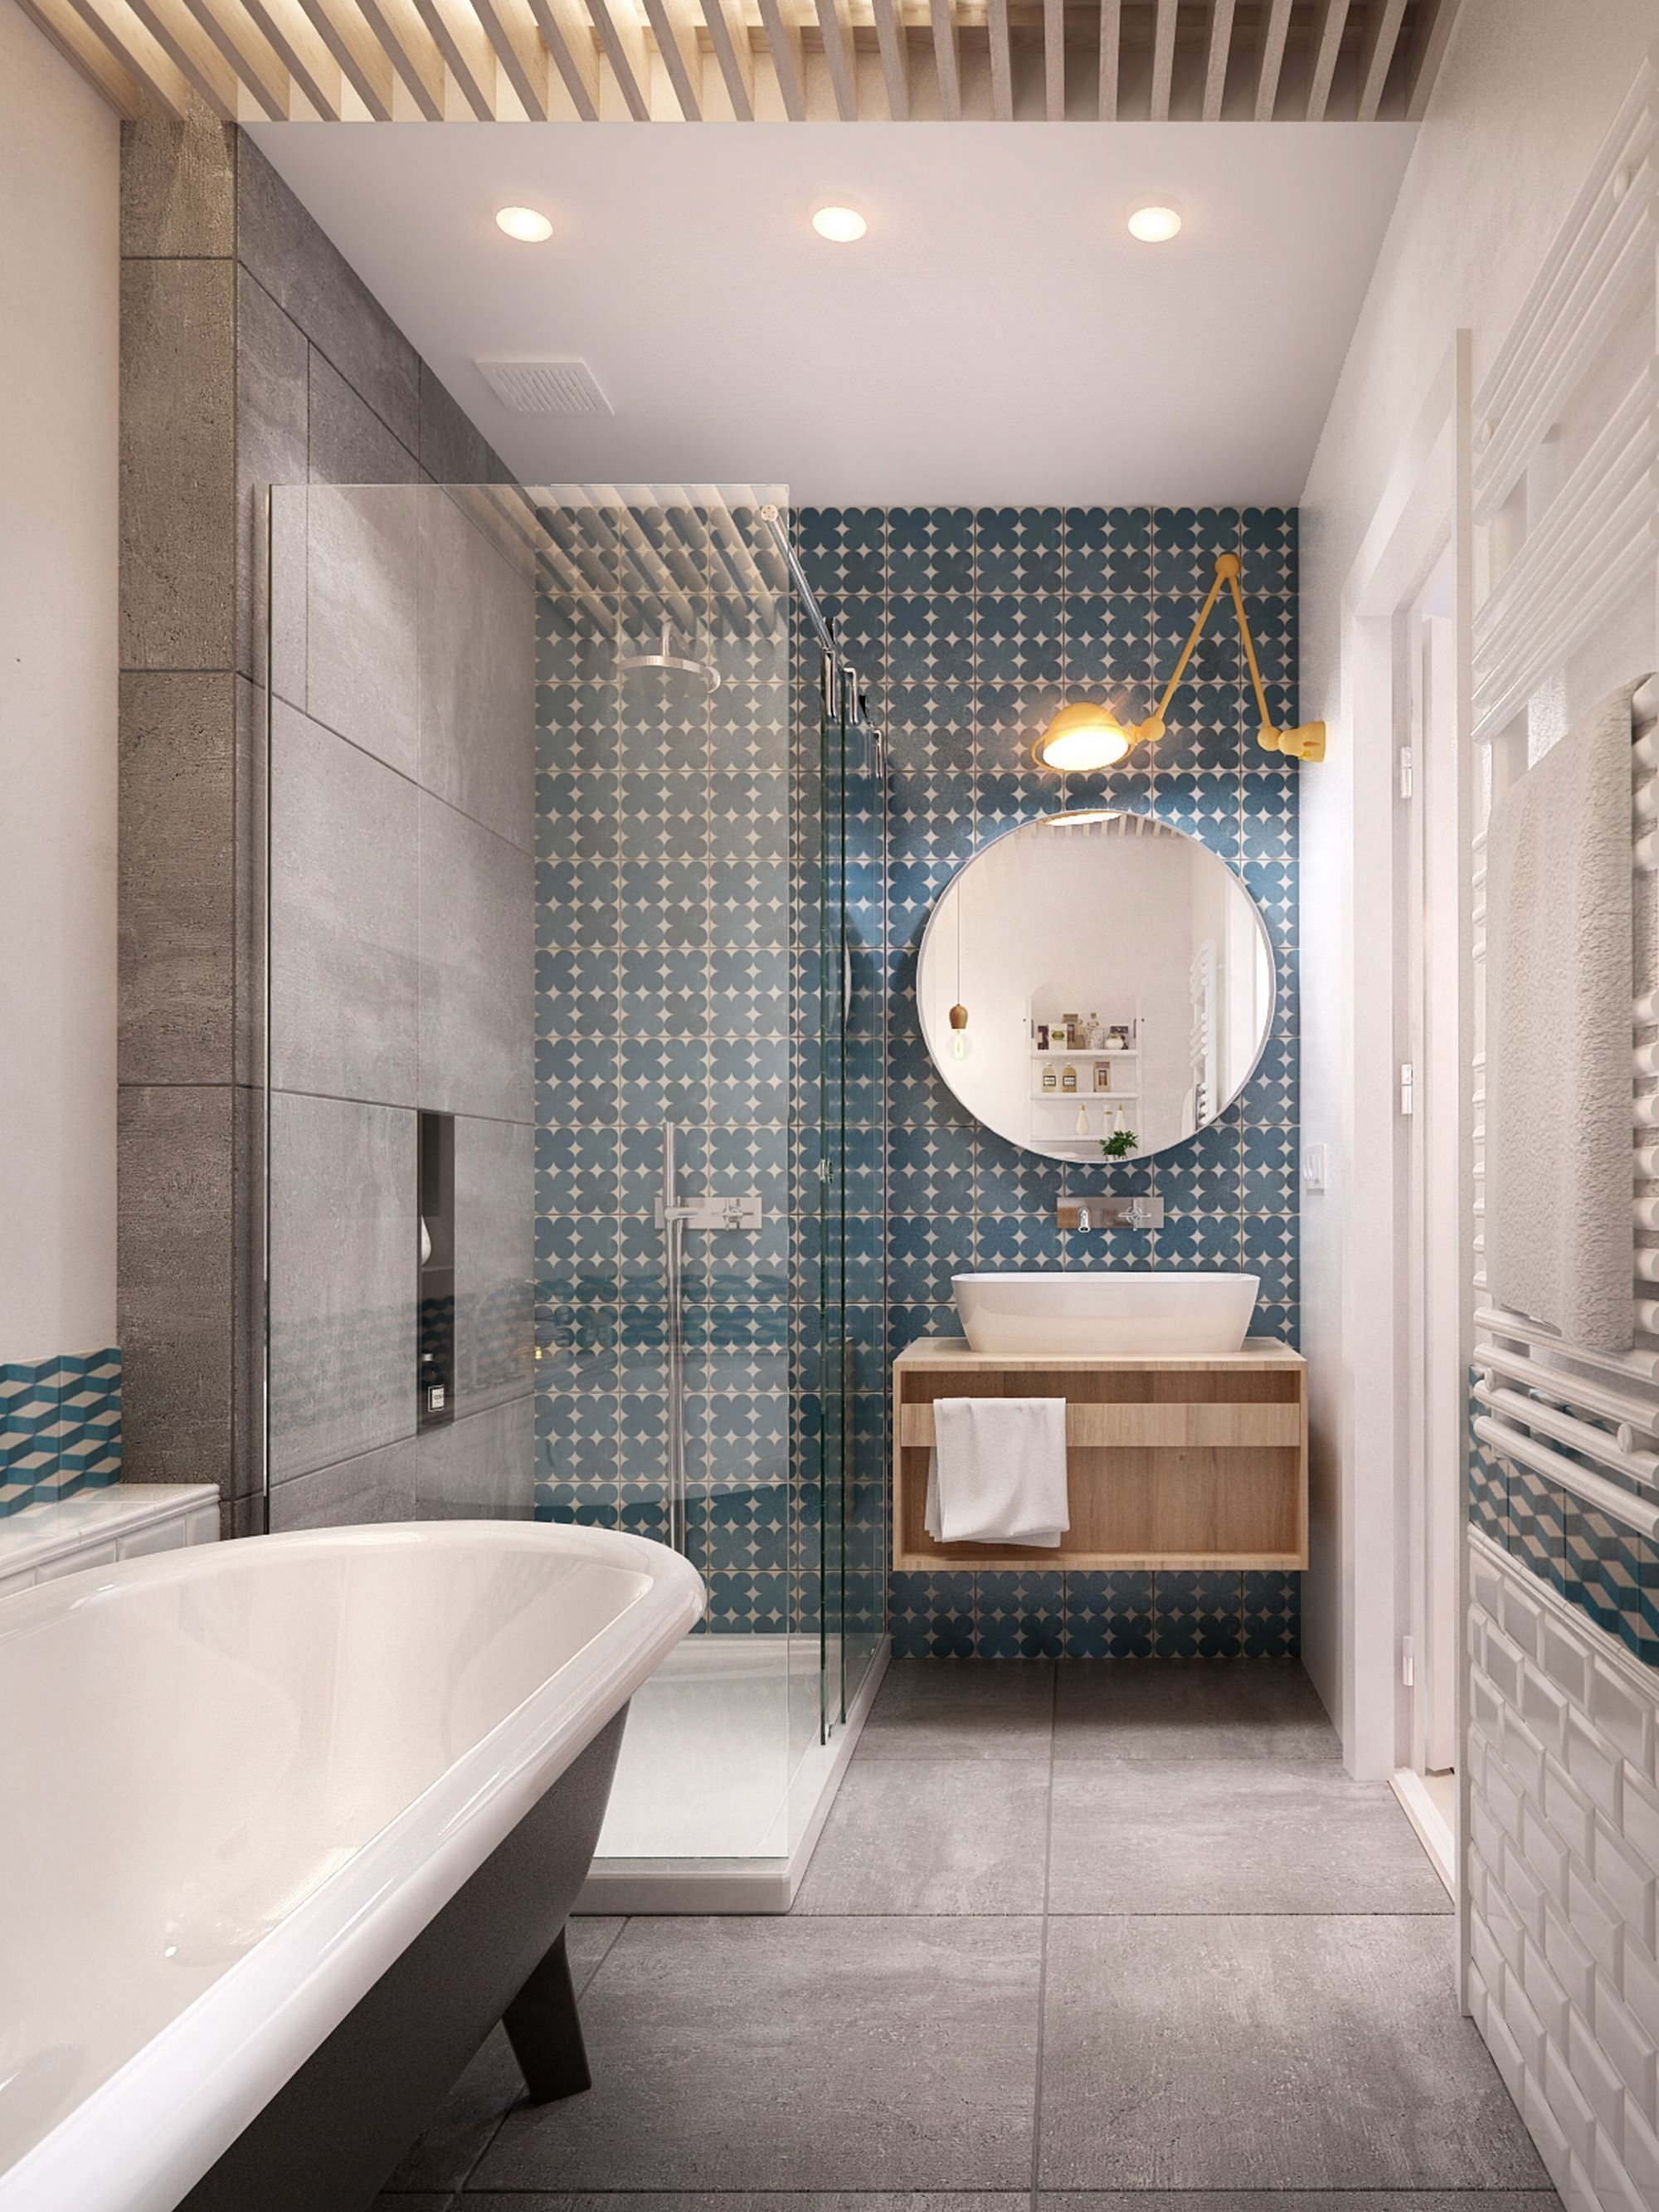 2018 Design Trends For The Bathroom Bathroom Interior Bathroom